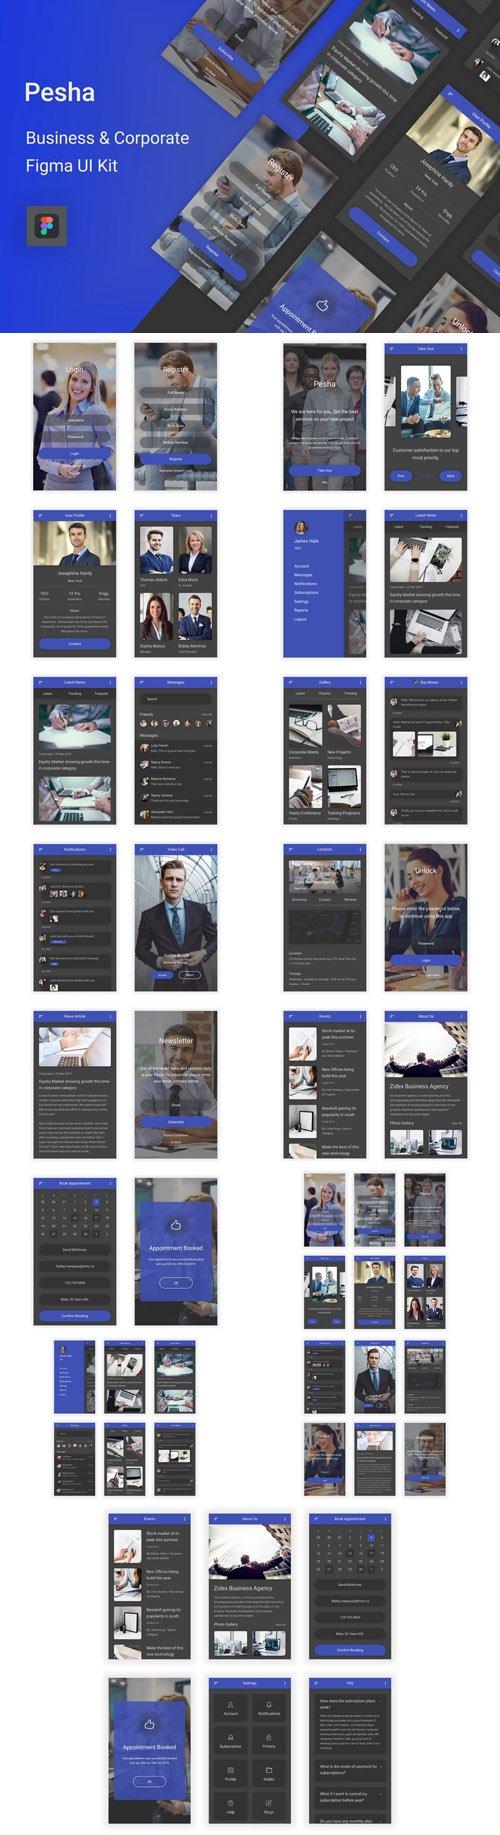 Pesha - Business & Corporate Figma UI Kit